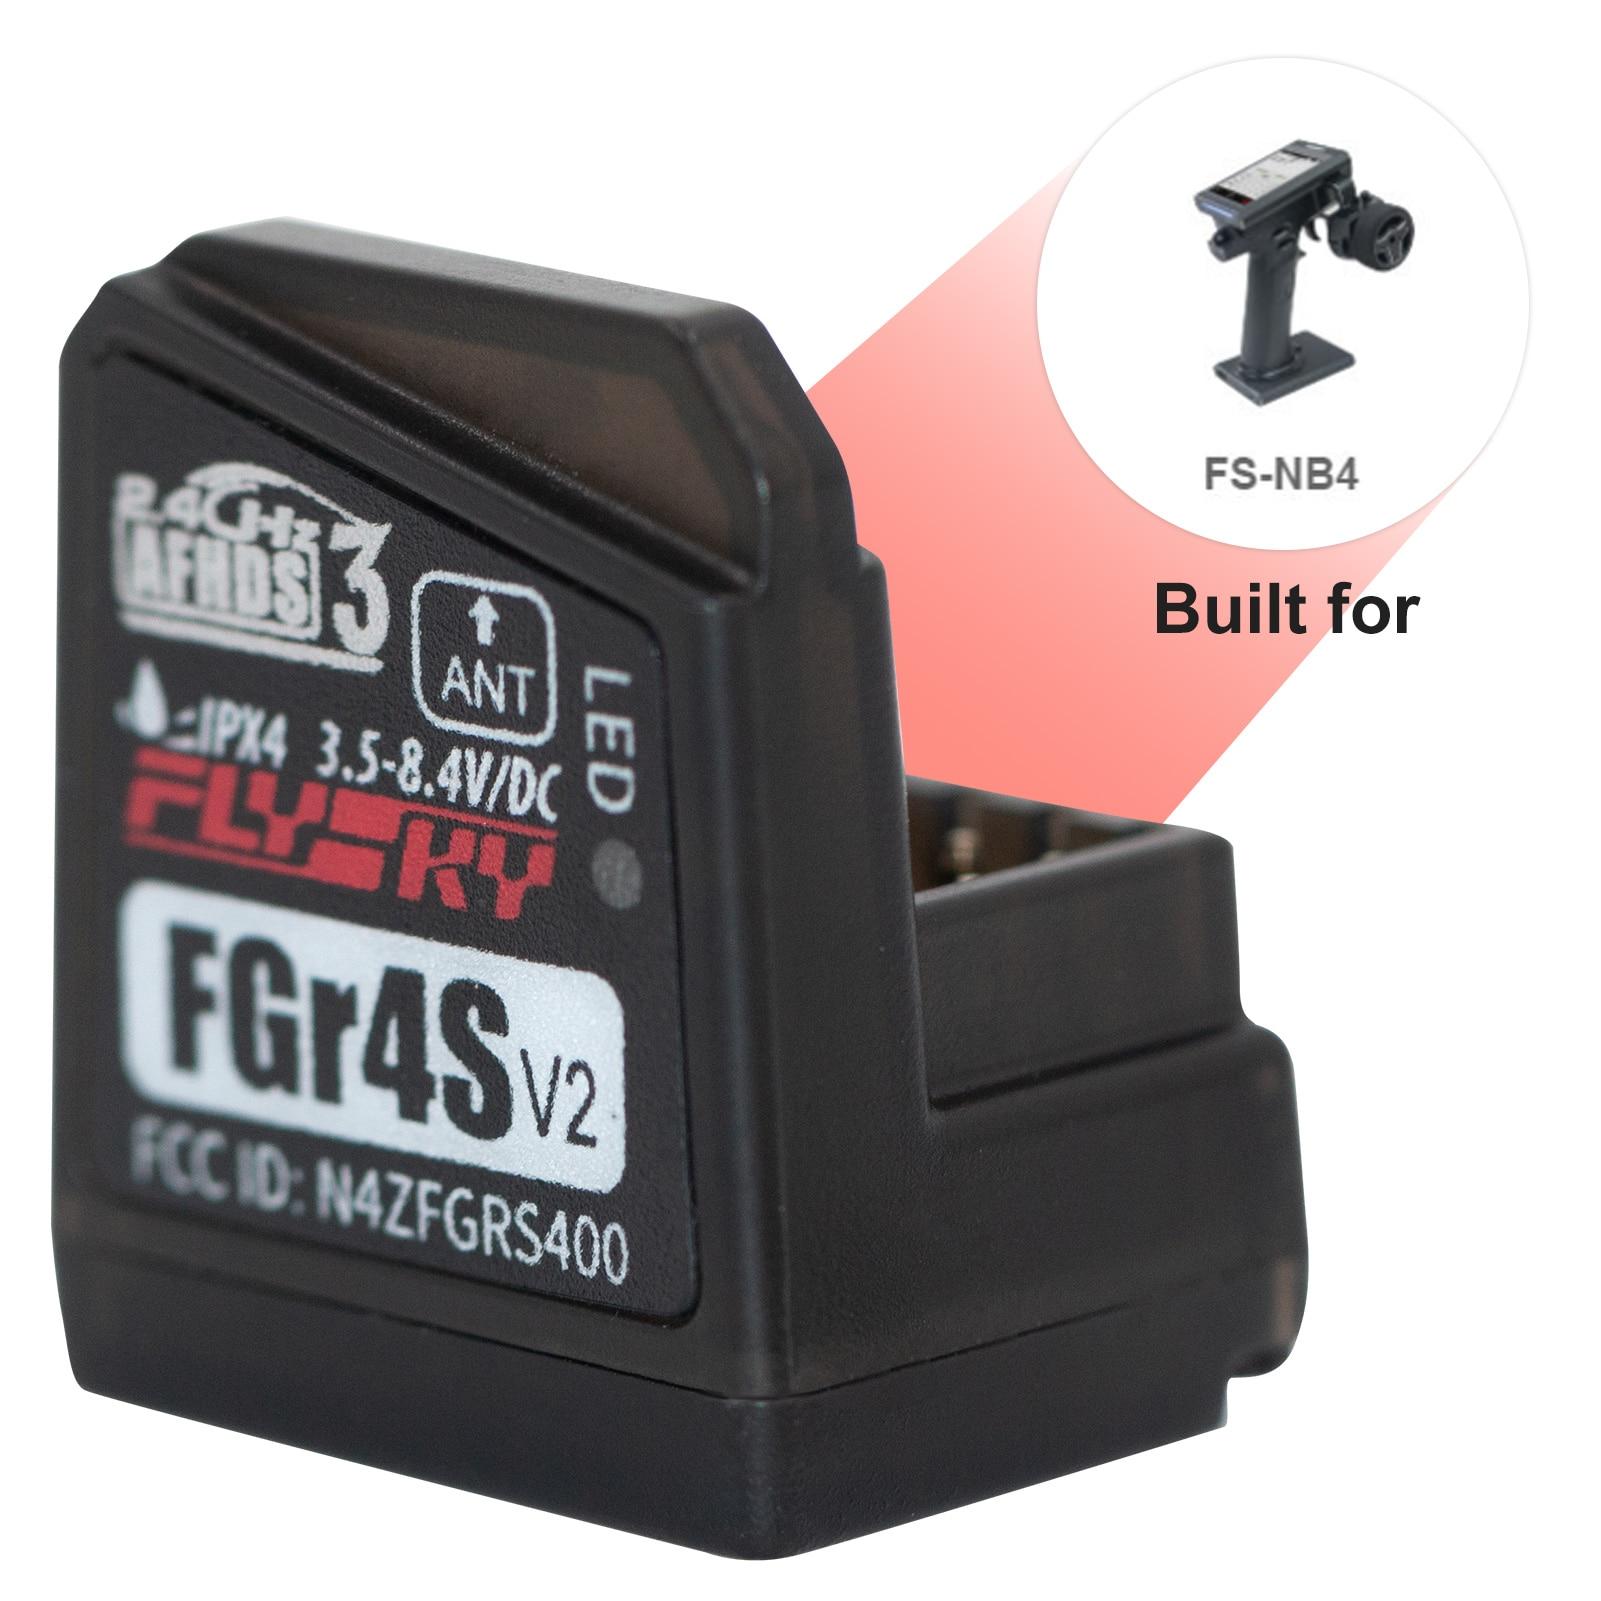 Flysky-جهاز استقبال FGR4S V2 AFHDS 3 ، ثنائي الاتجاه ، PWM /PPM / IBUS ، لجهاز إرسال Flysky NB4 PL18 RC